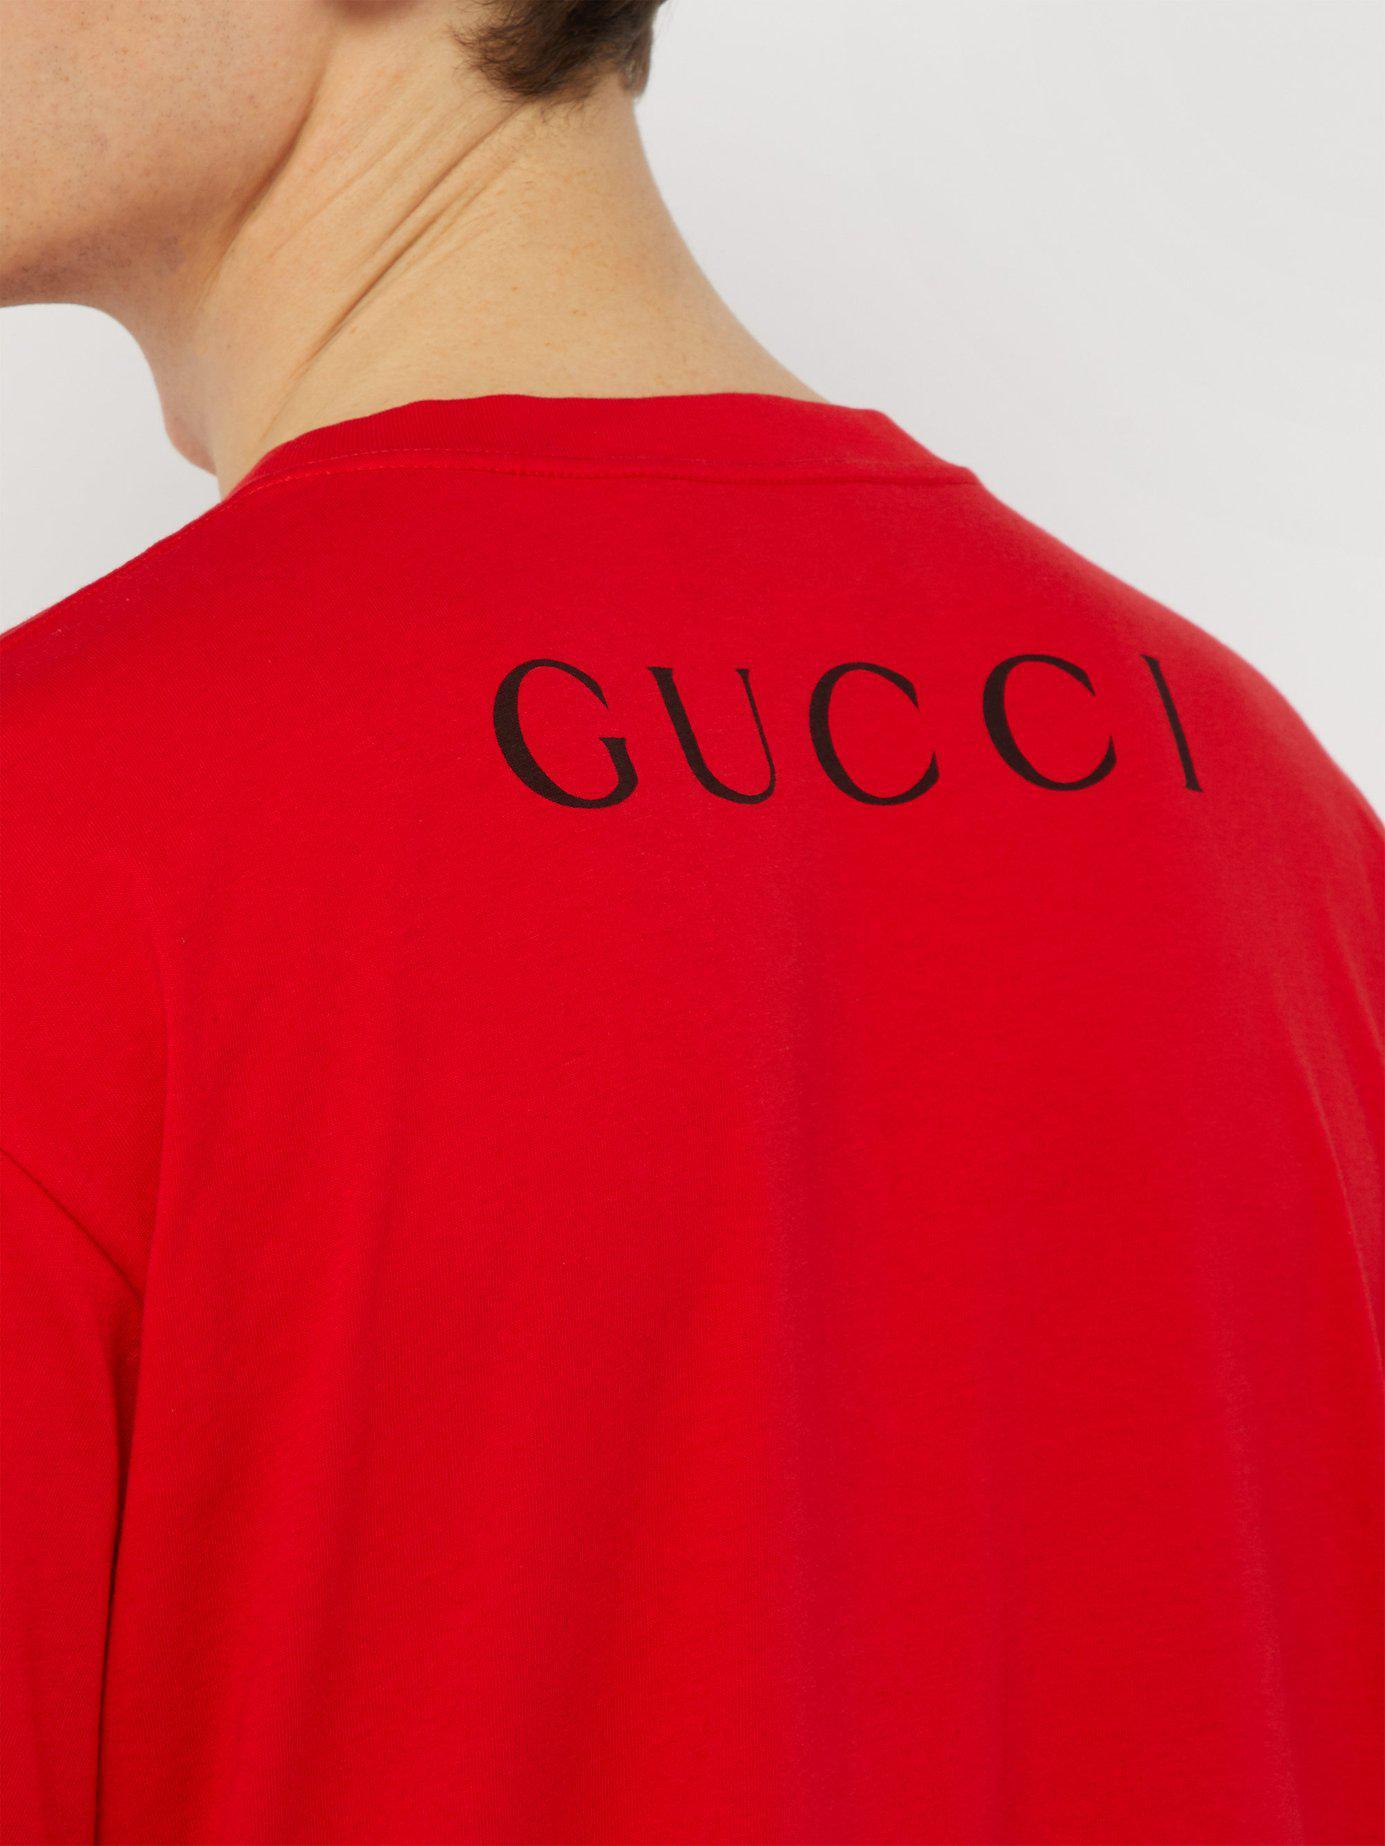 c4e123dc33e Gucci - Red Billy Idol Printed T Shirt for Men - Lyst. View fullscreen